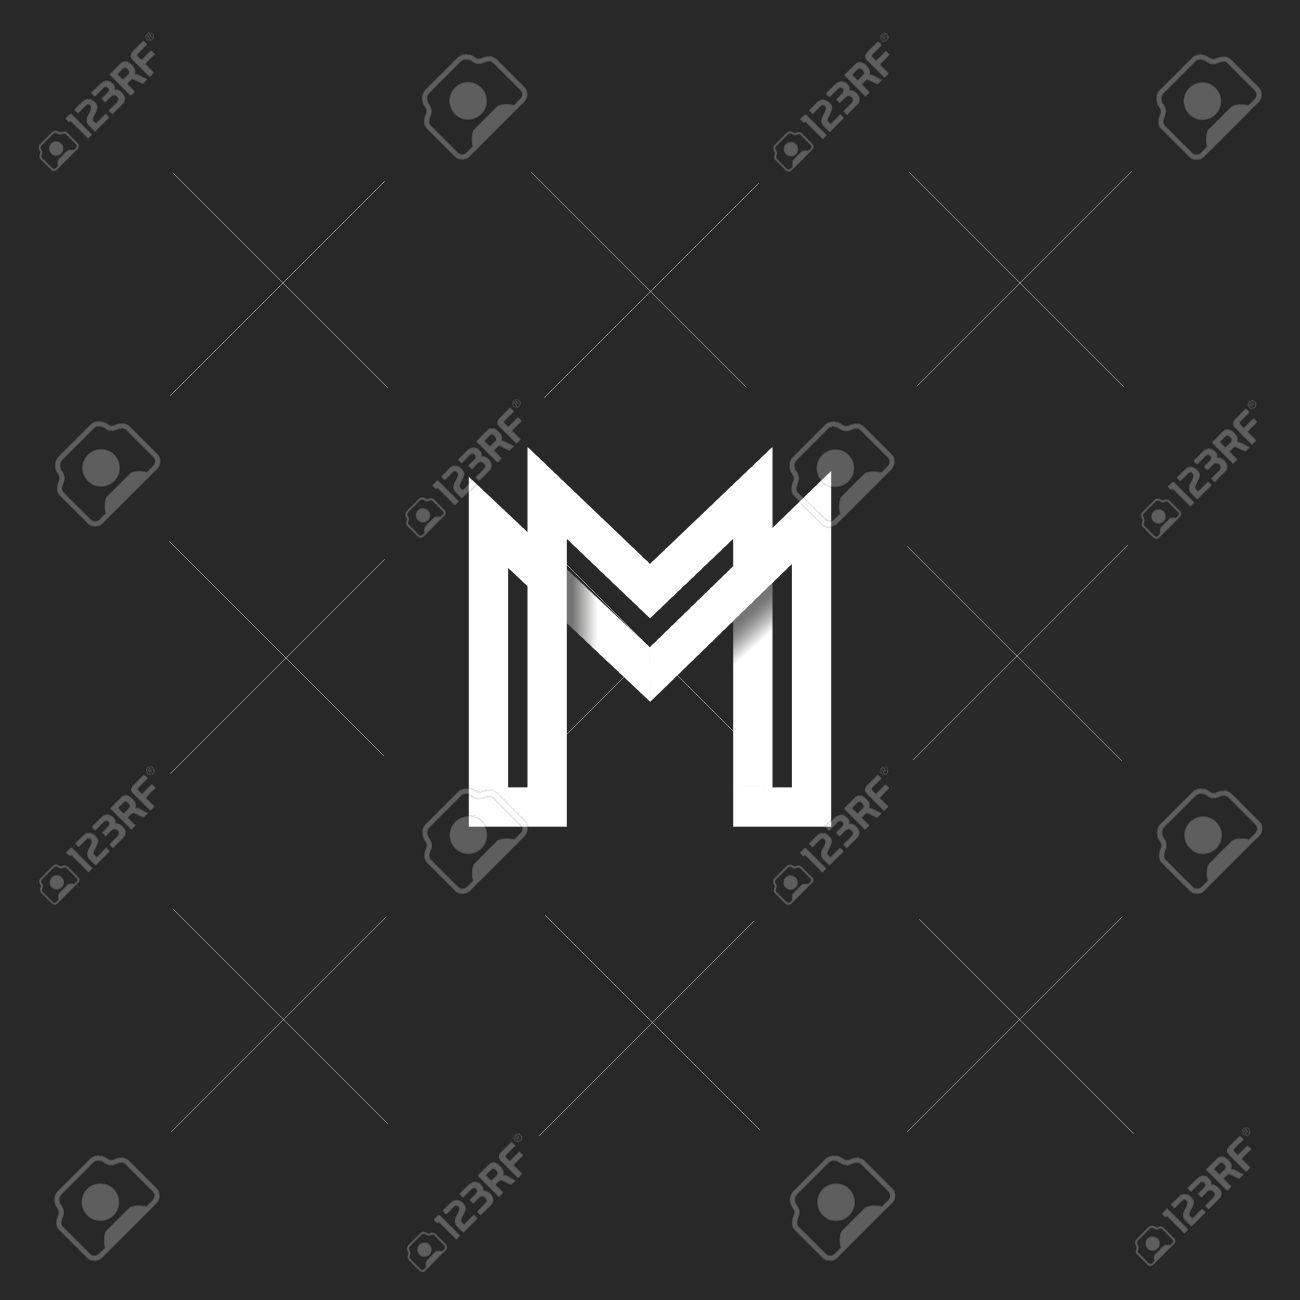 Tj initial luxury ornament monogram logo stock vector - M Monogram Letter M Logo Monogram Overlapping Line Mark Mm Initials Combination Symbol Mockup